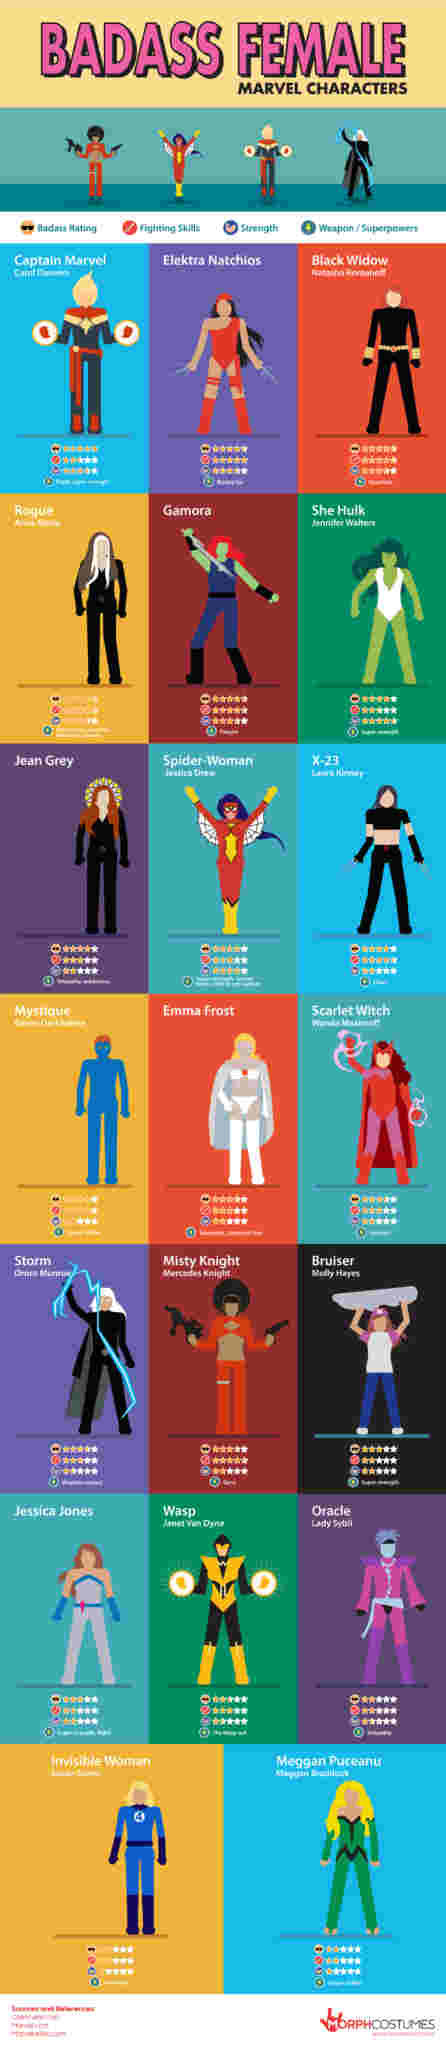 Badass-Female-Marvel-Characters-3